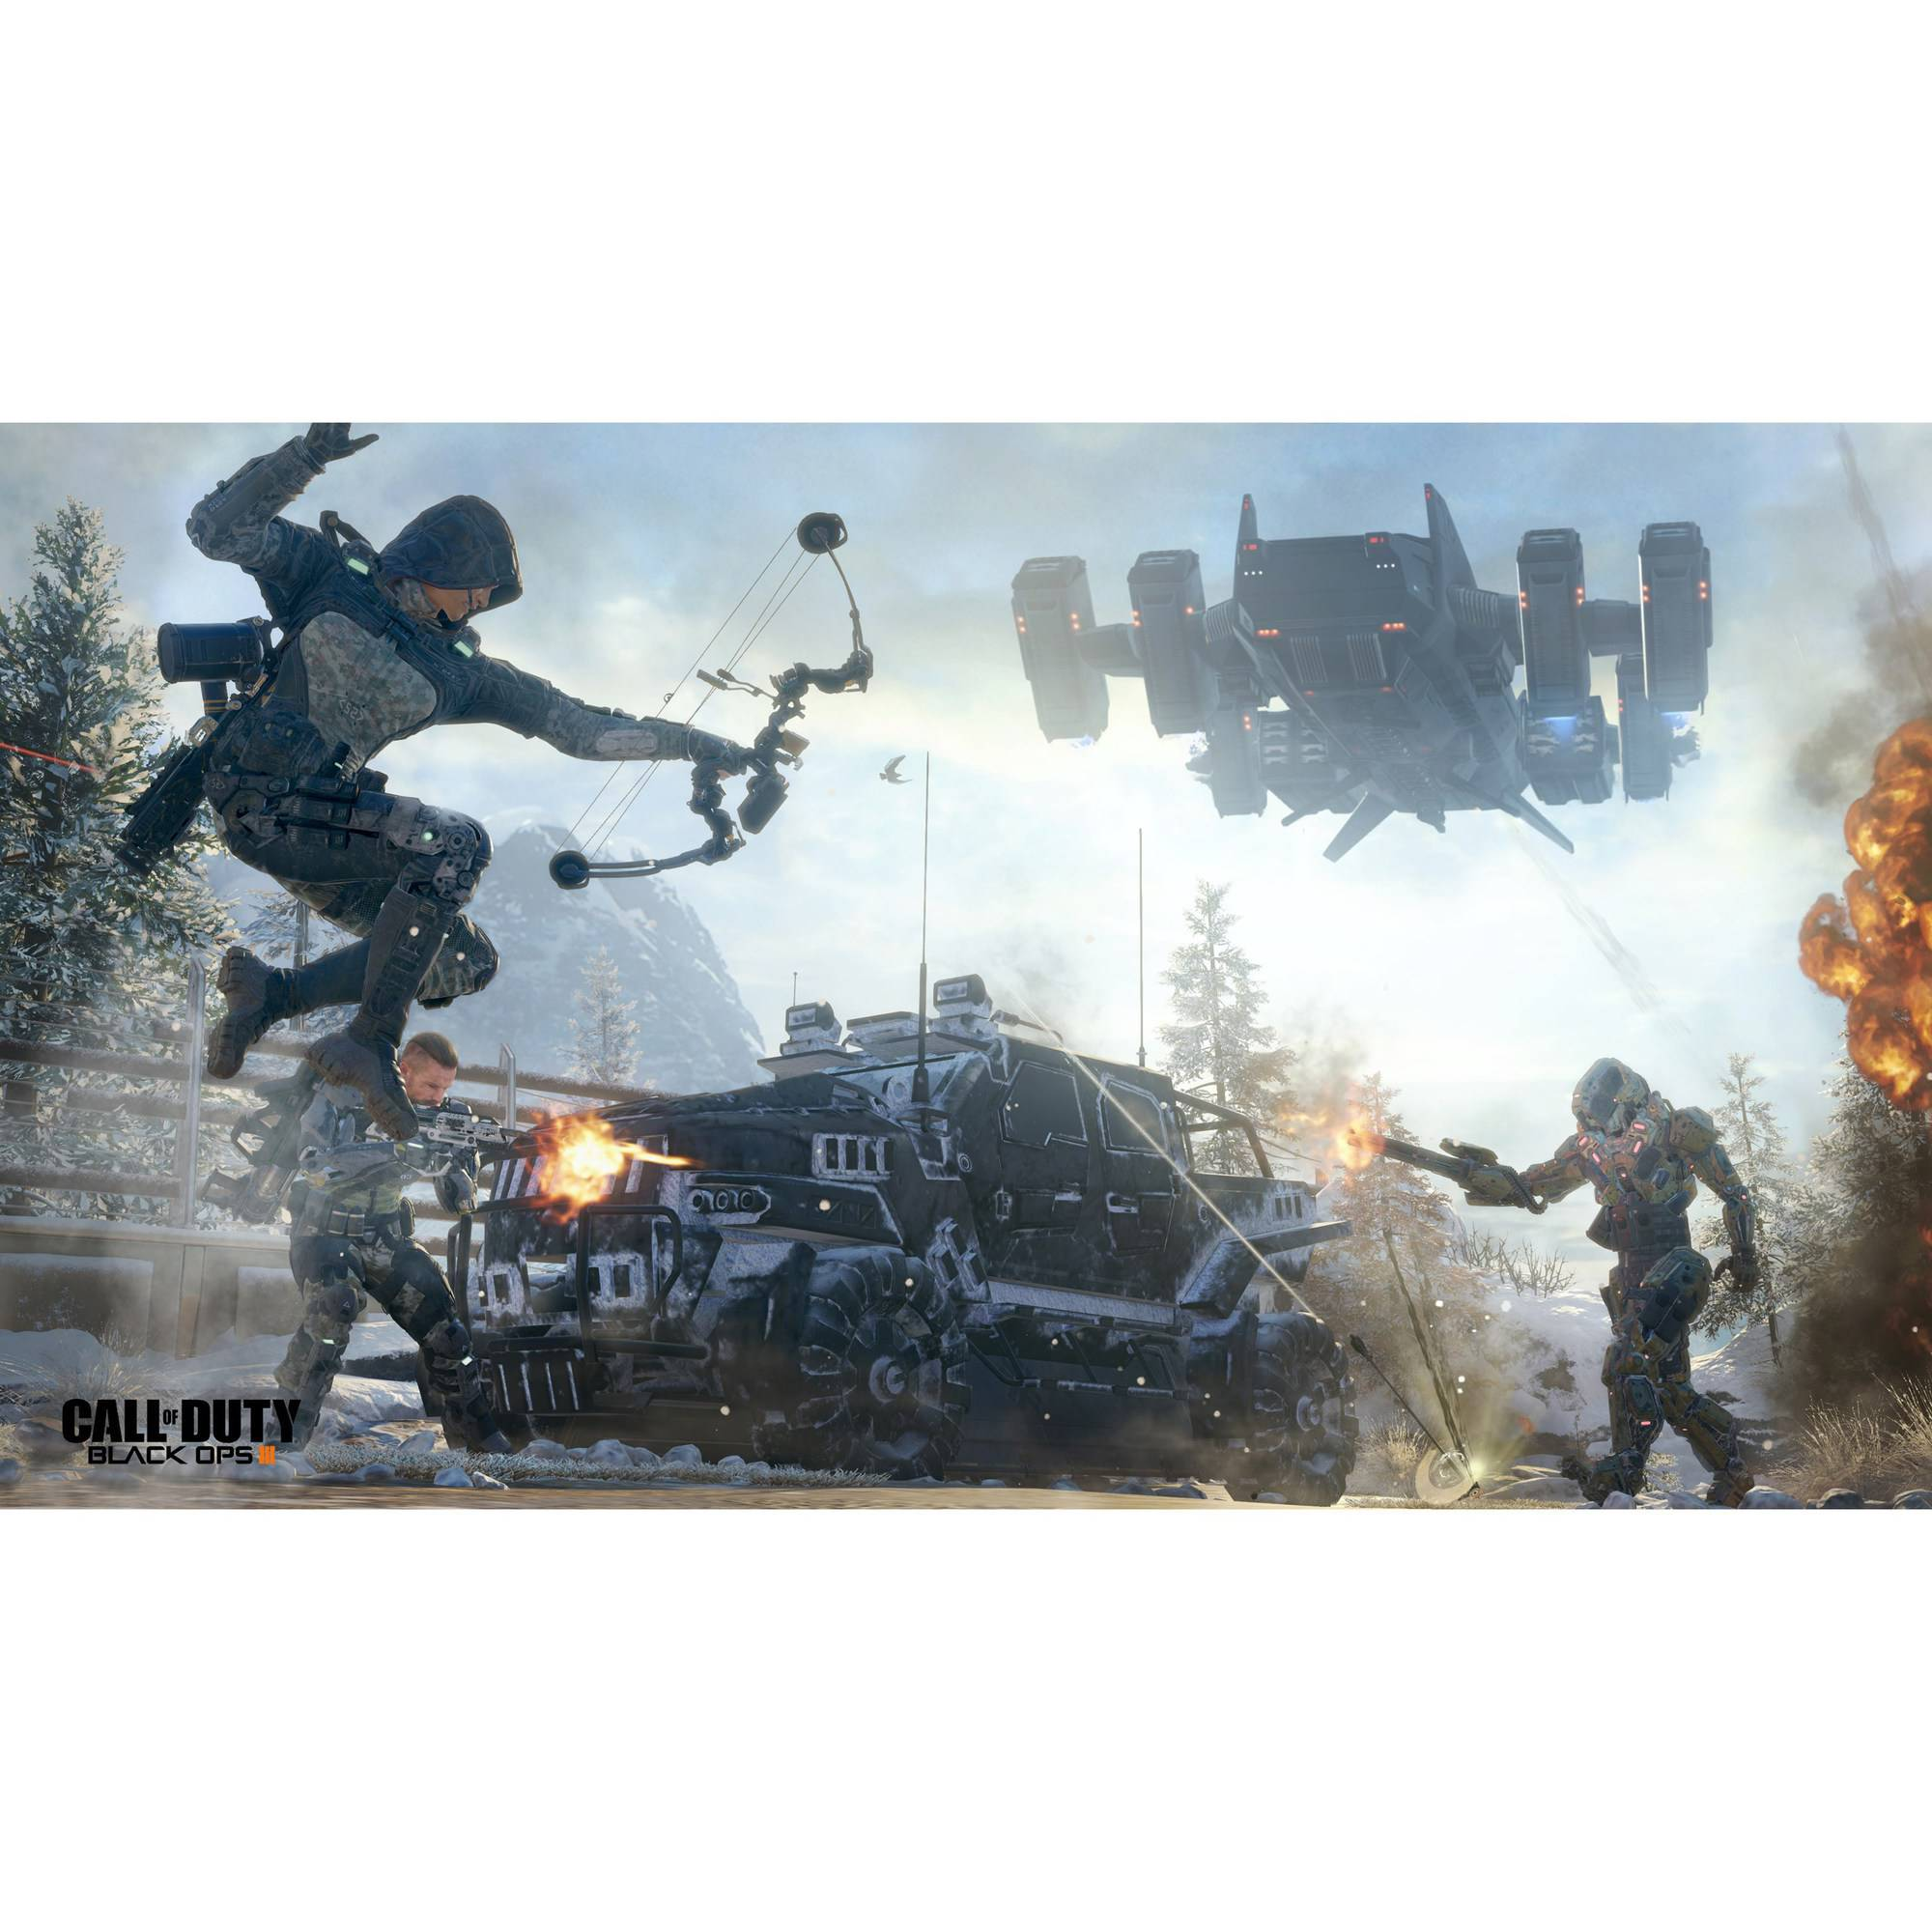 call of duty black ops iii (xbox 360) - walmart